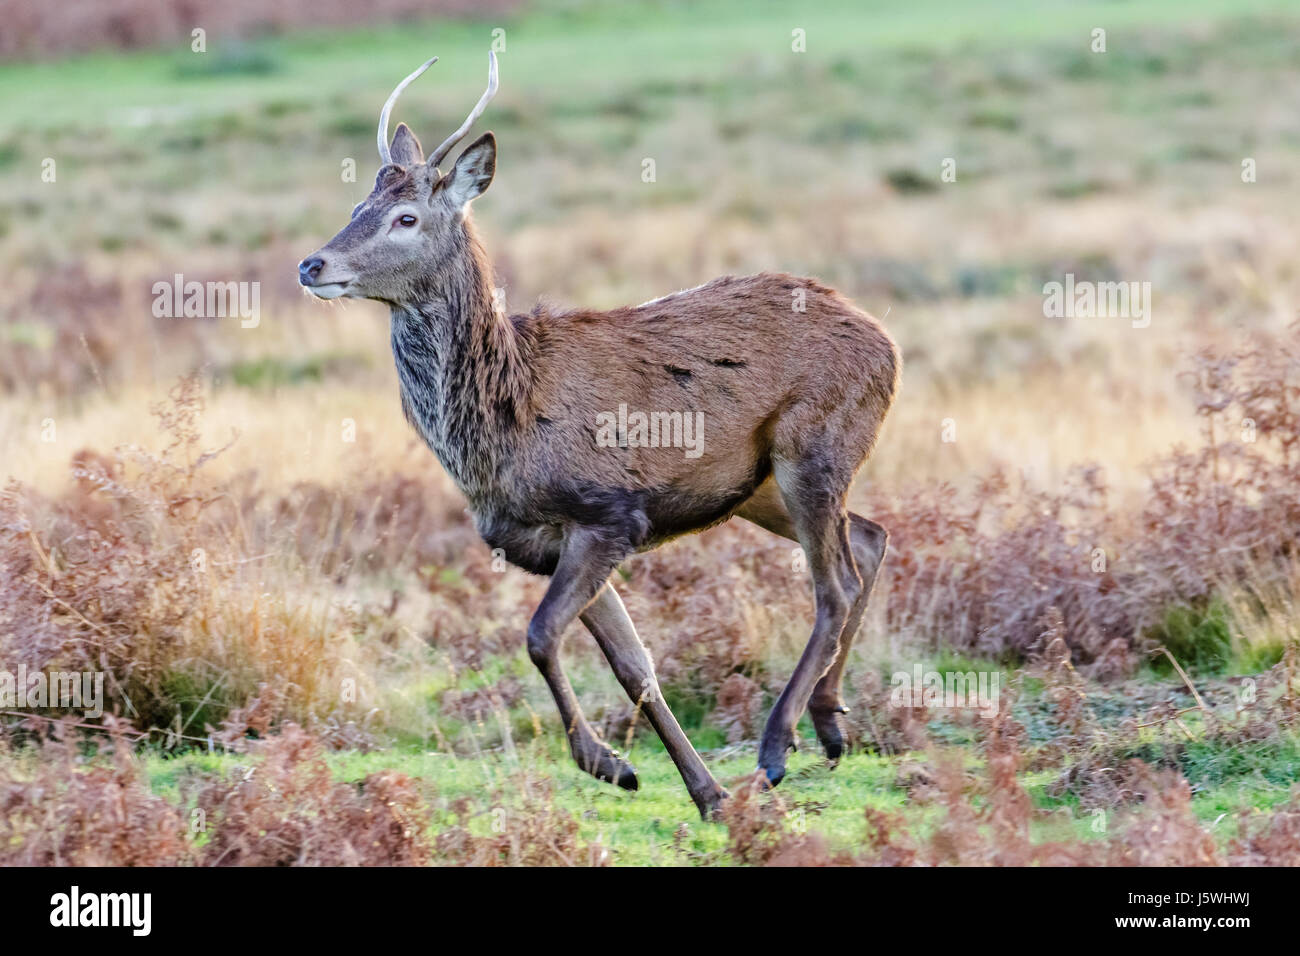 Single young Red Deer male (Cervus elaphus) pricket or yearling running across bracken moorland or parkland - Stock Image